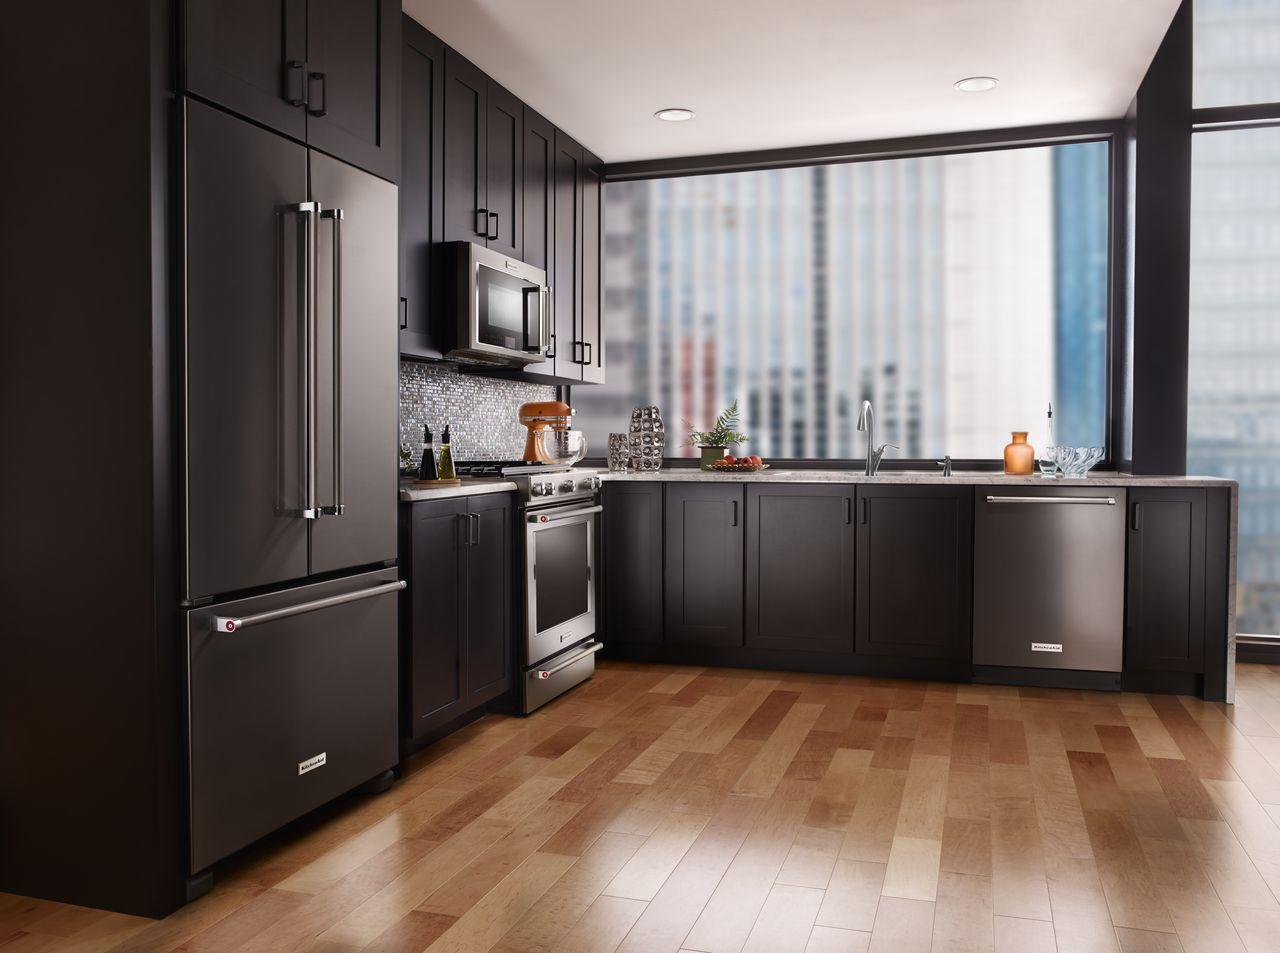 black stainless steel kitchen cabinet knobs ideas appliance color trends 2016  loretta j willis